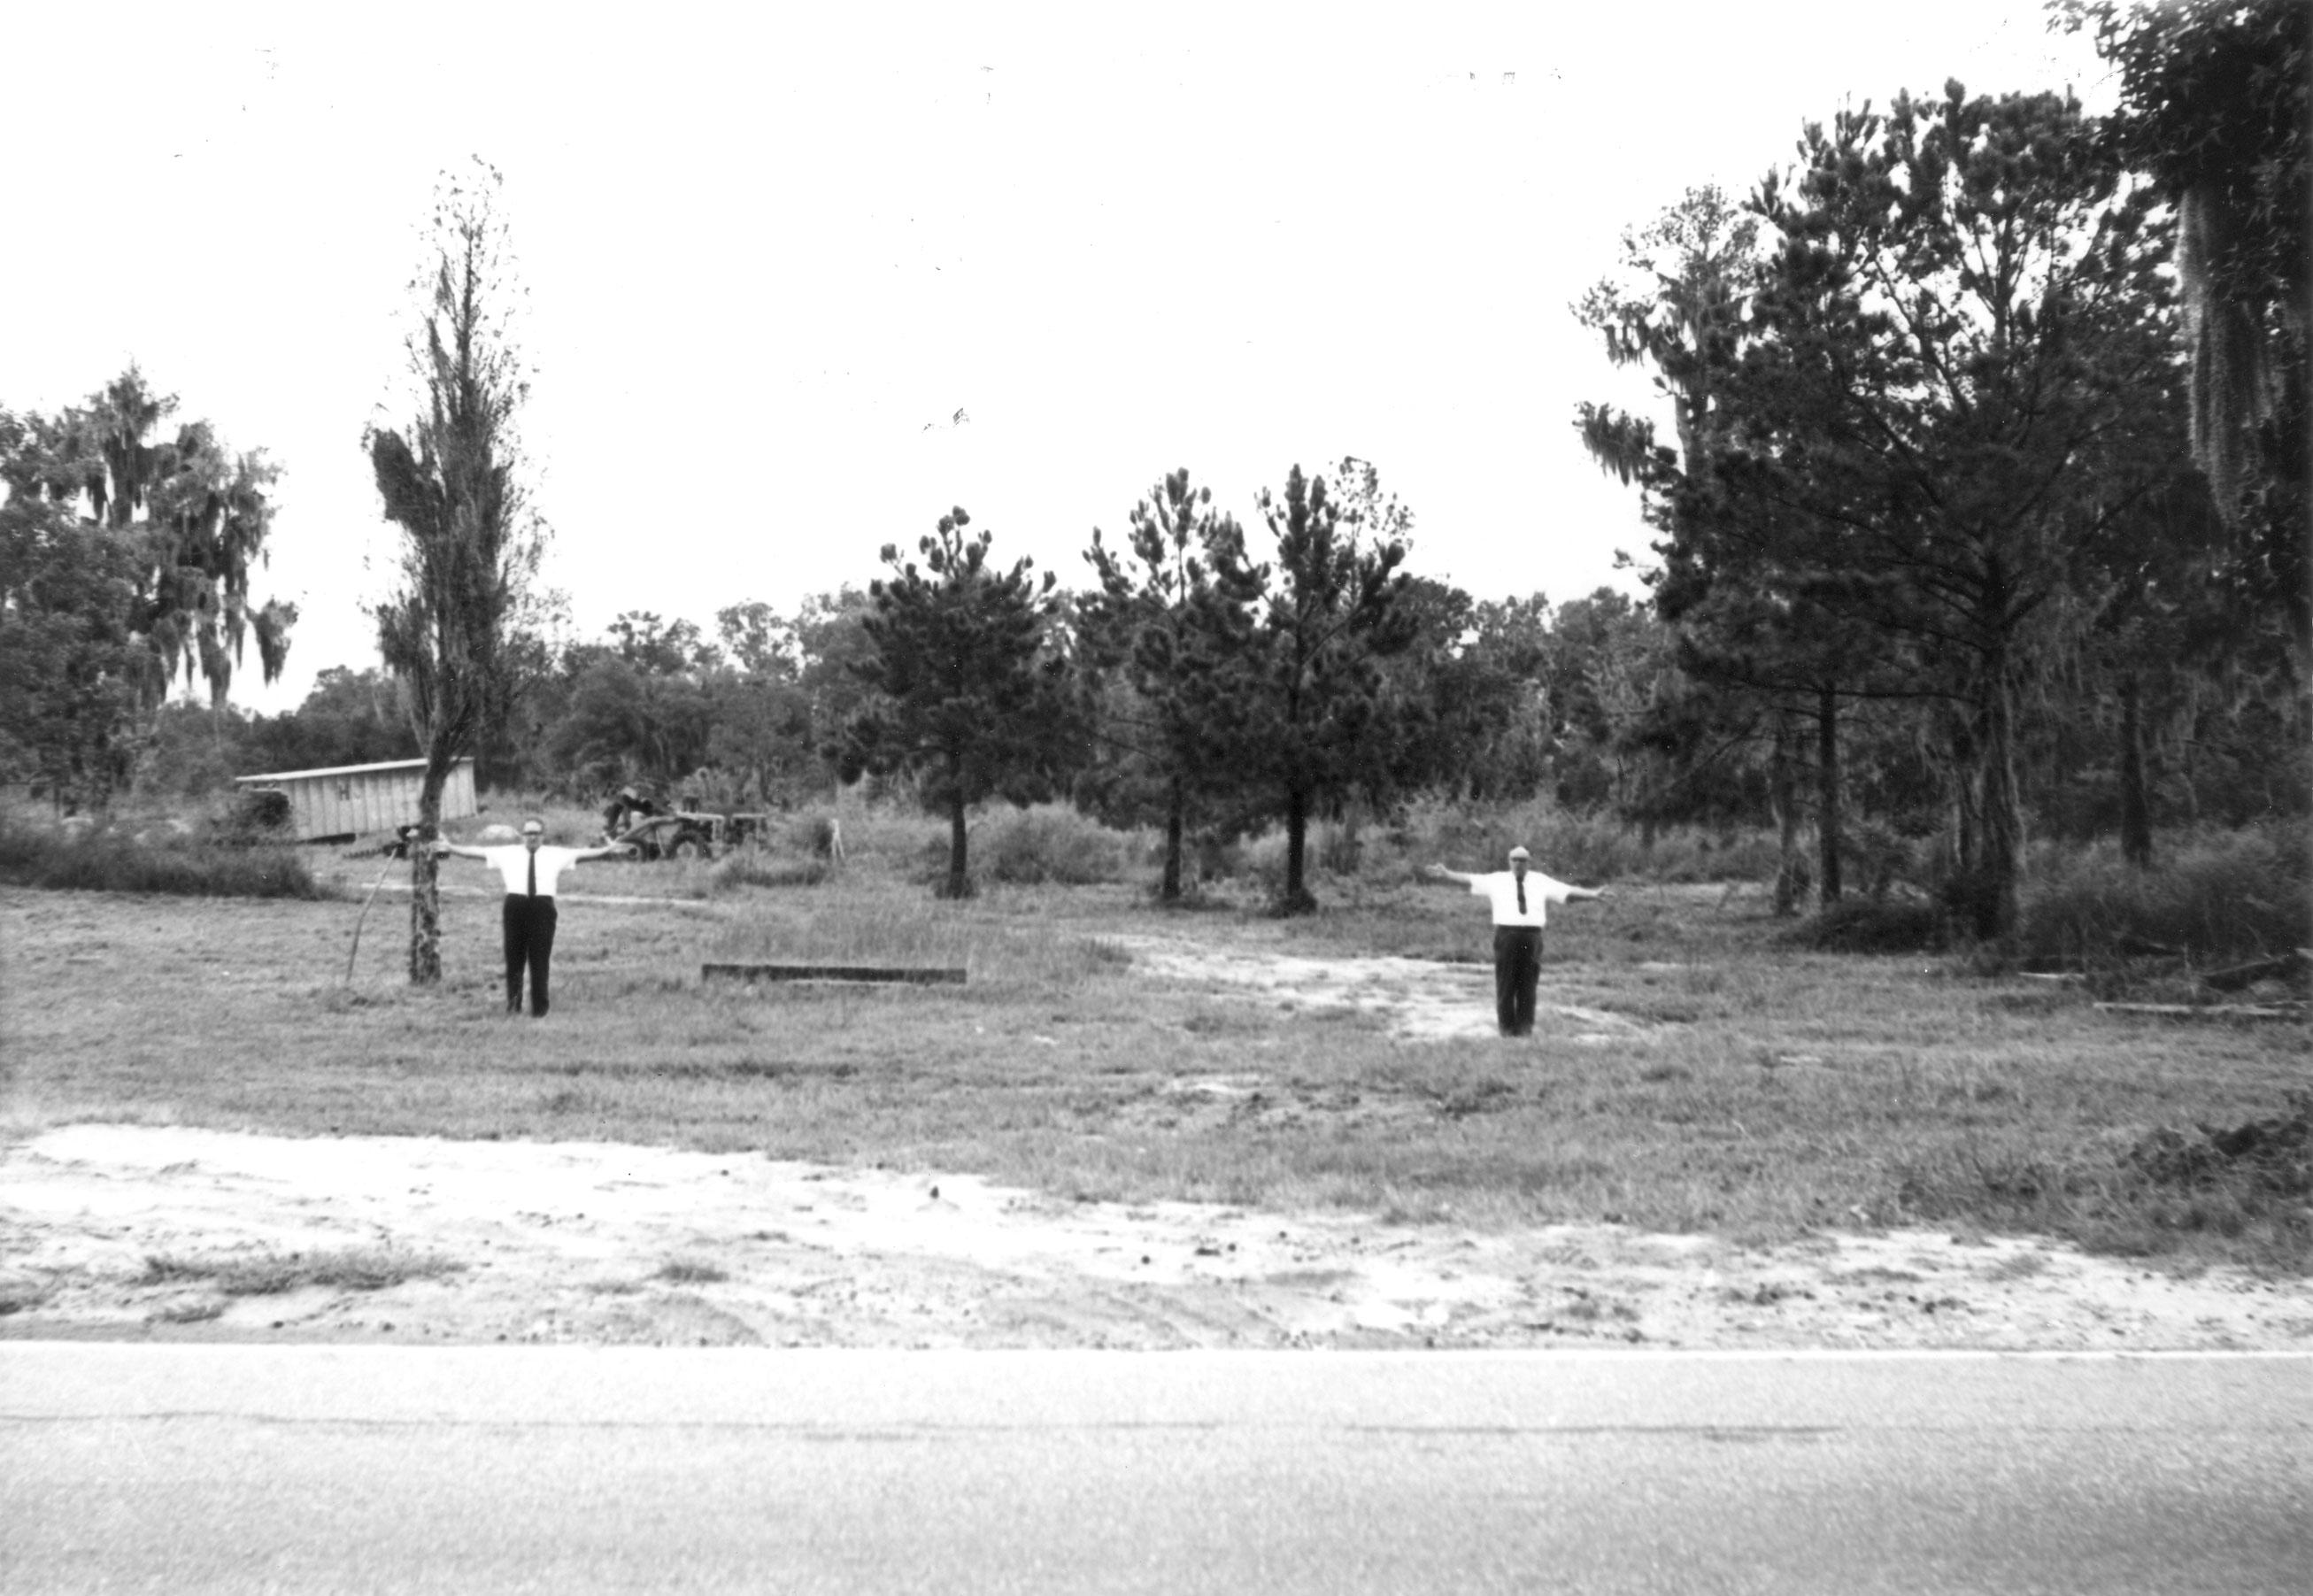 US Route 17 Photo 642